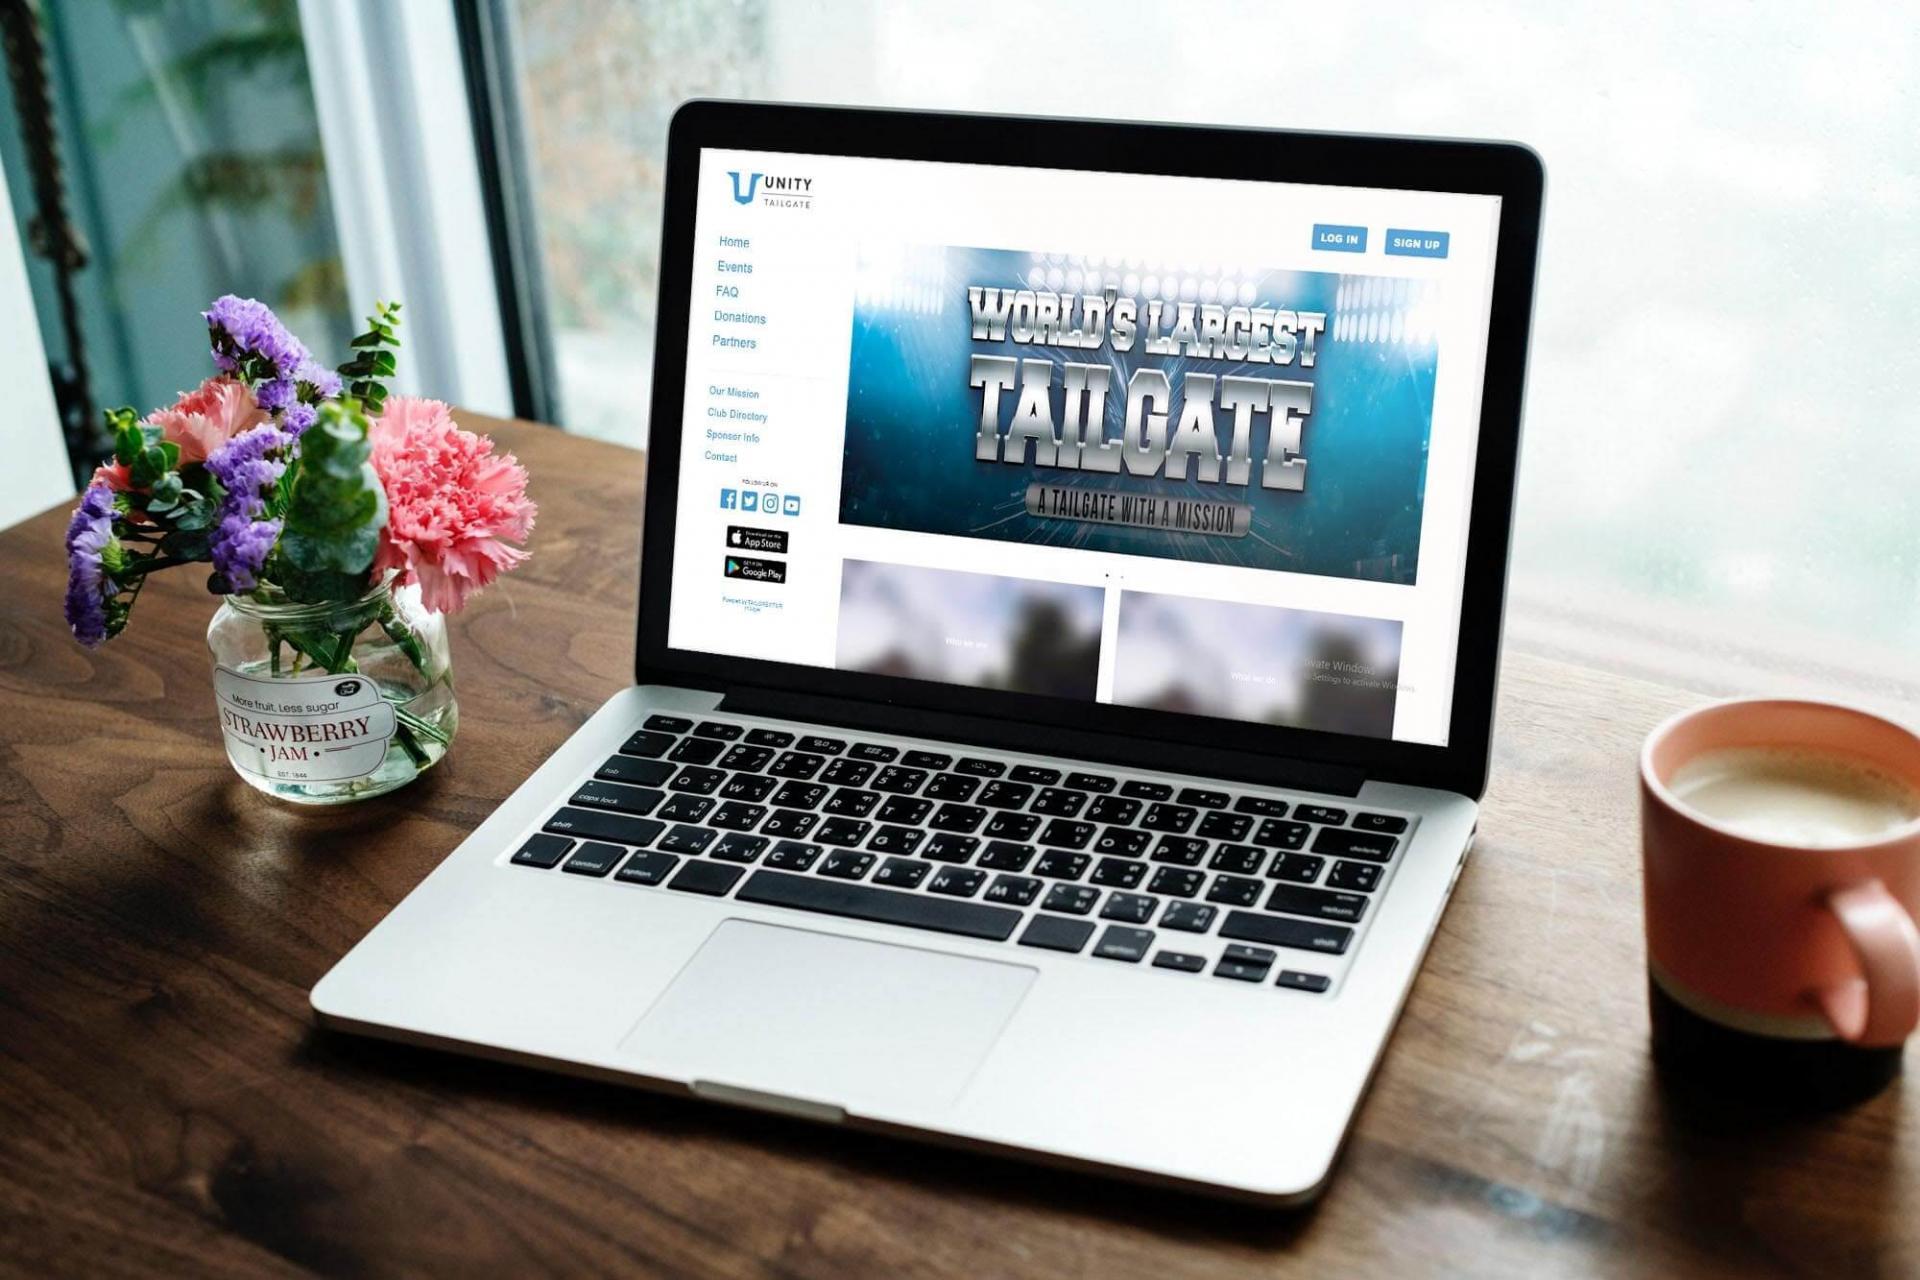 Unity tailgate website